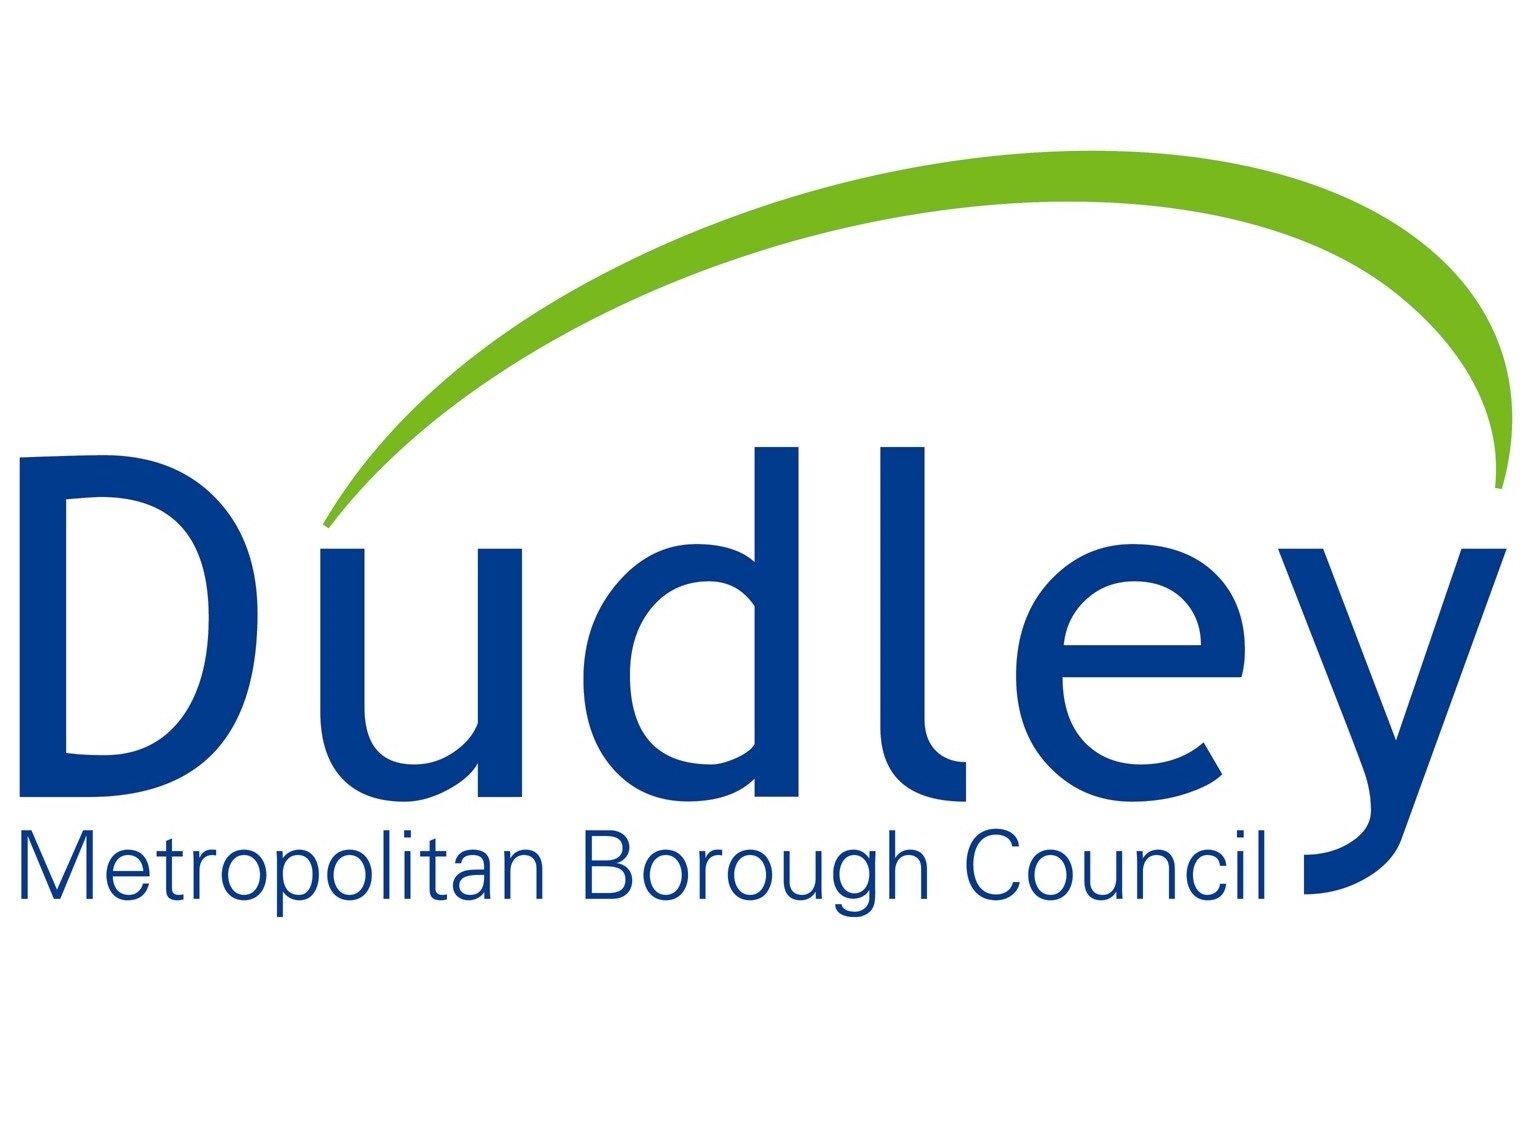 Dudley council logo